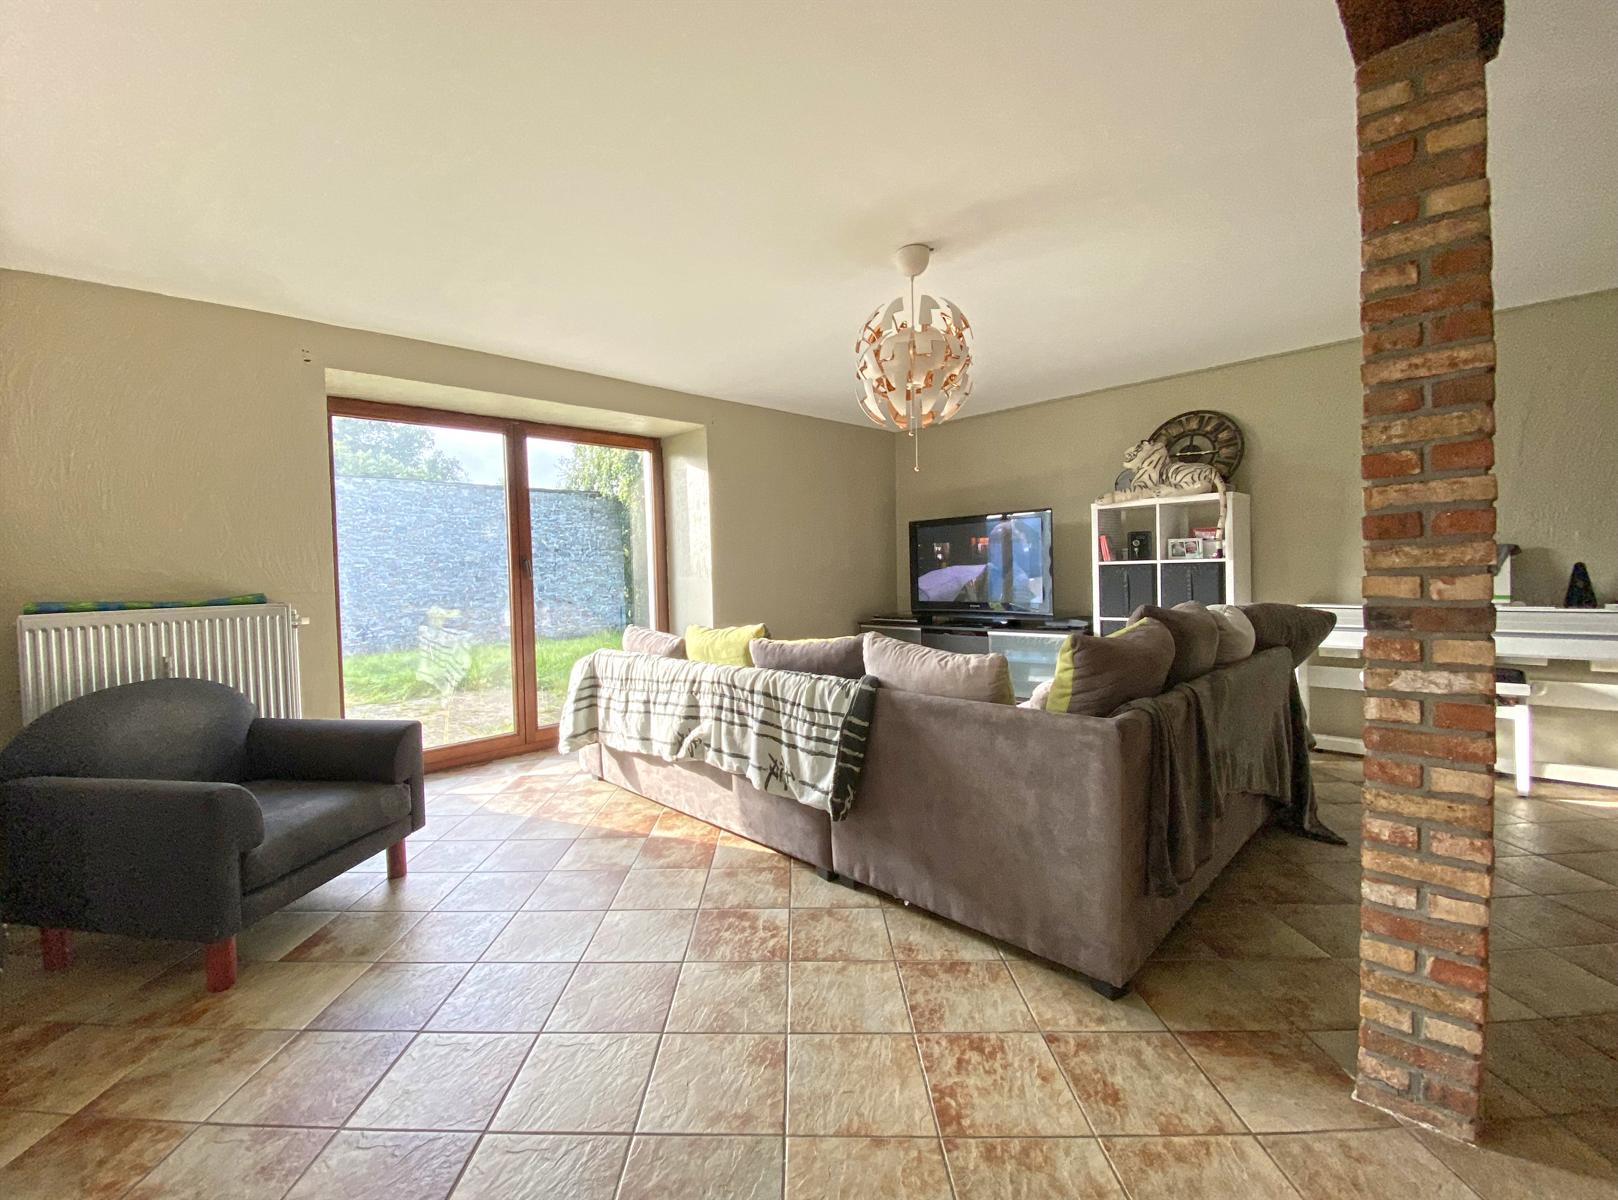 Maison - Libramont-Chevigny - #4508306-1